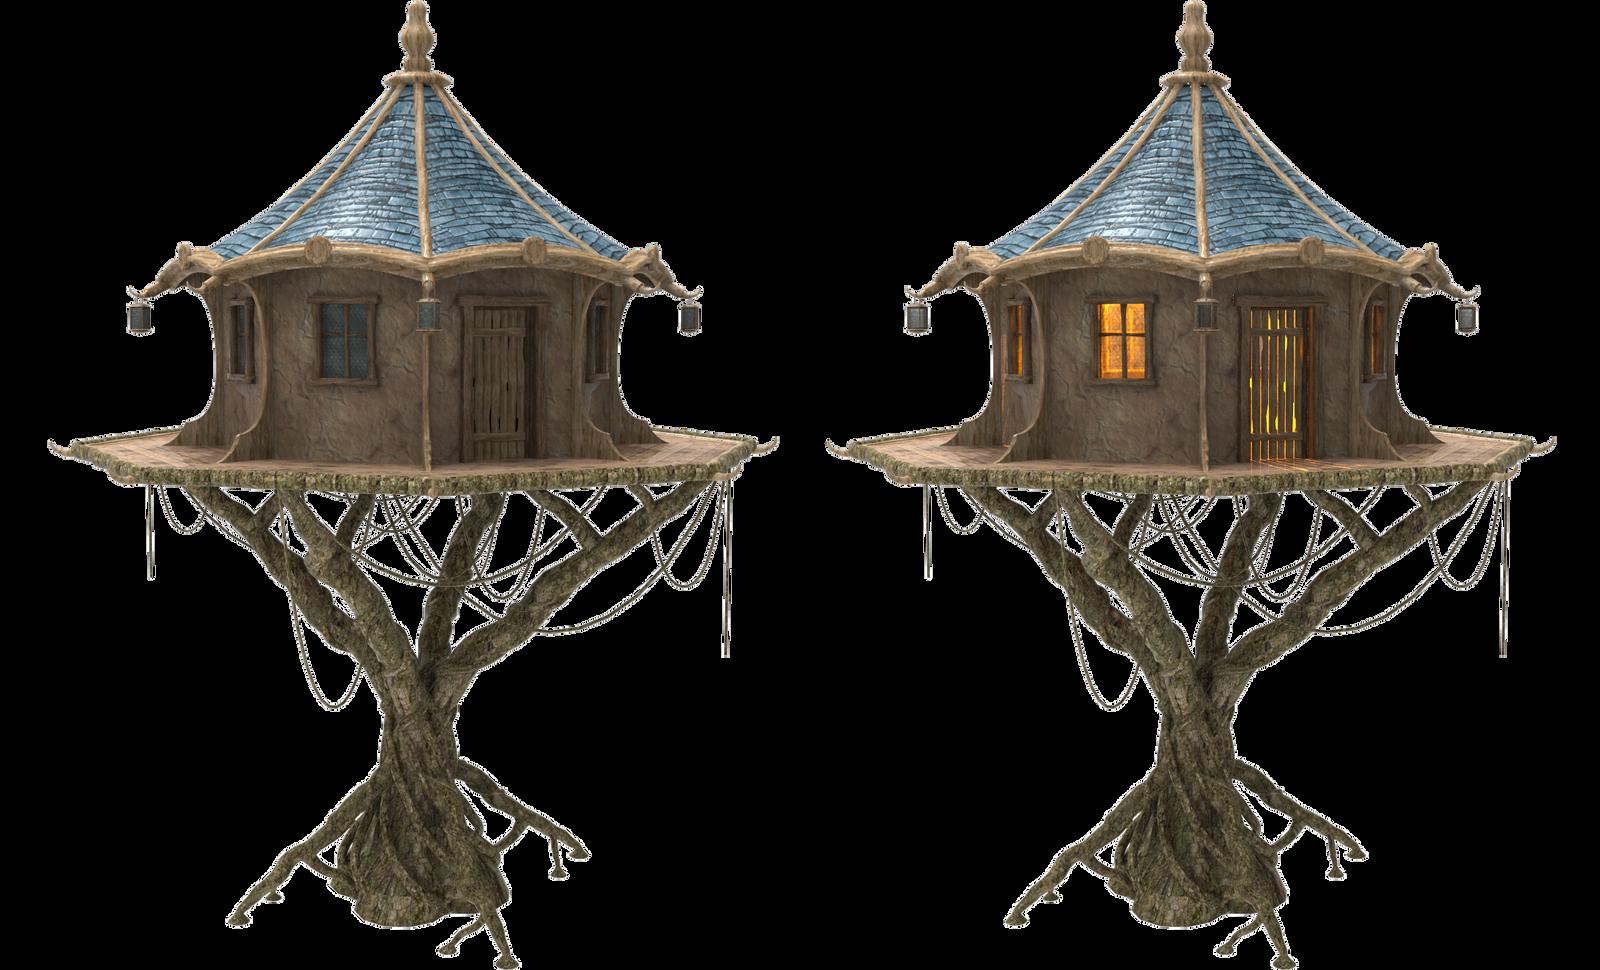 Treehouse House Fairy Tree House X 2 By Fumar Porros On Deviantart